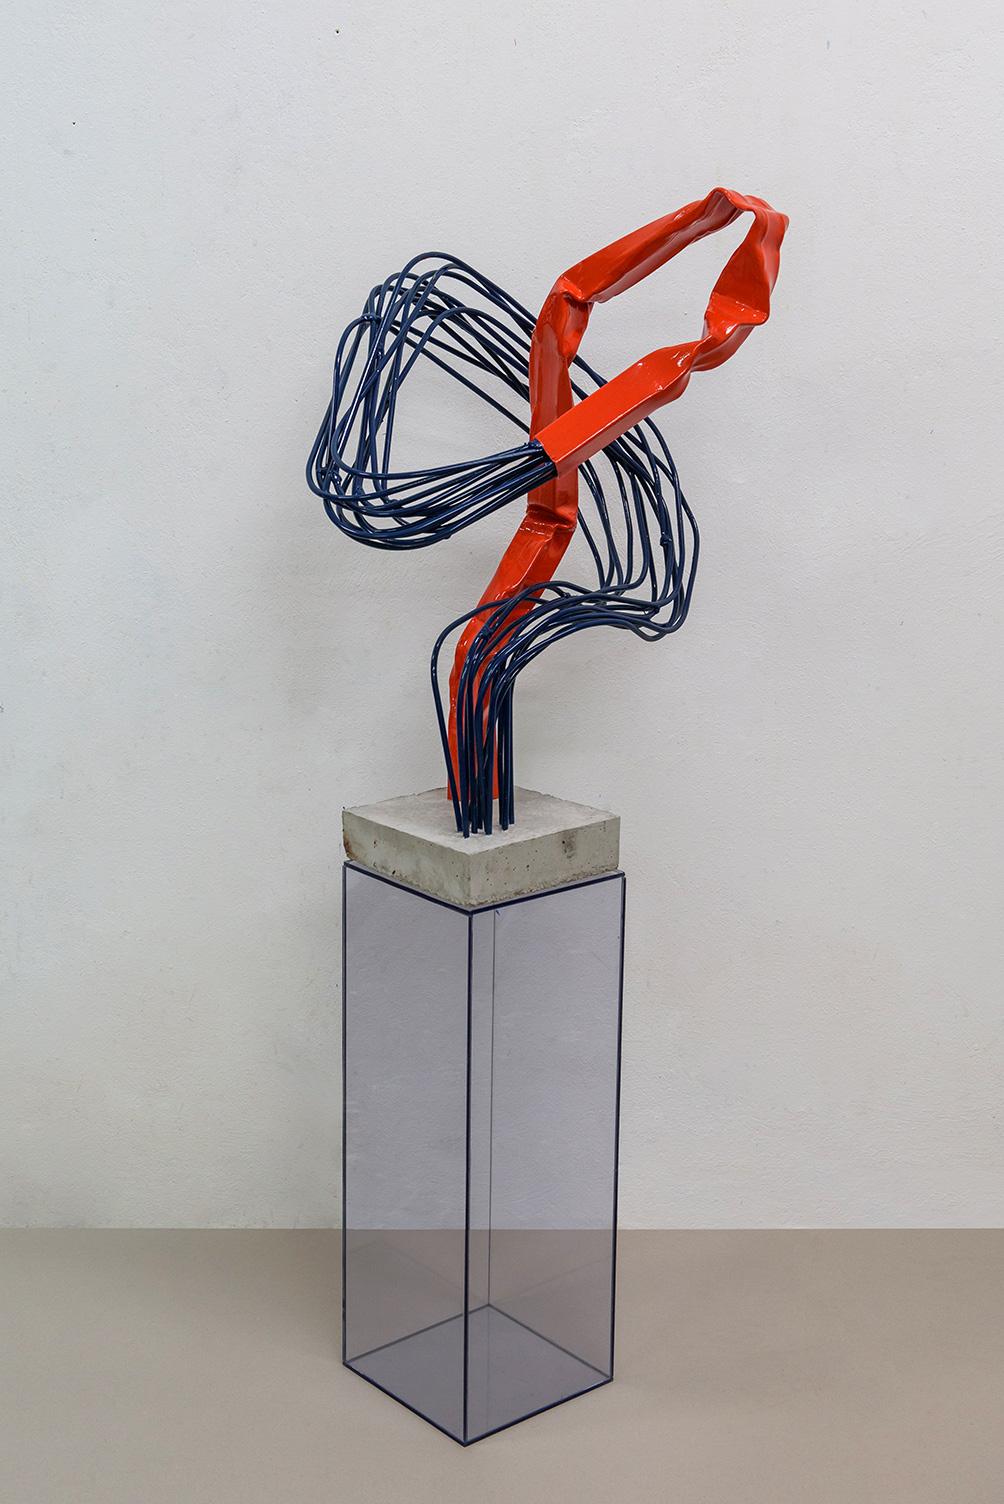 Contact, Iron, cement, colour, 168 x 45 x 45 cm, 2020, Athens